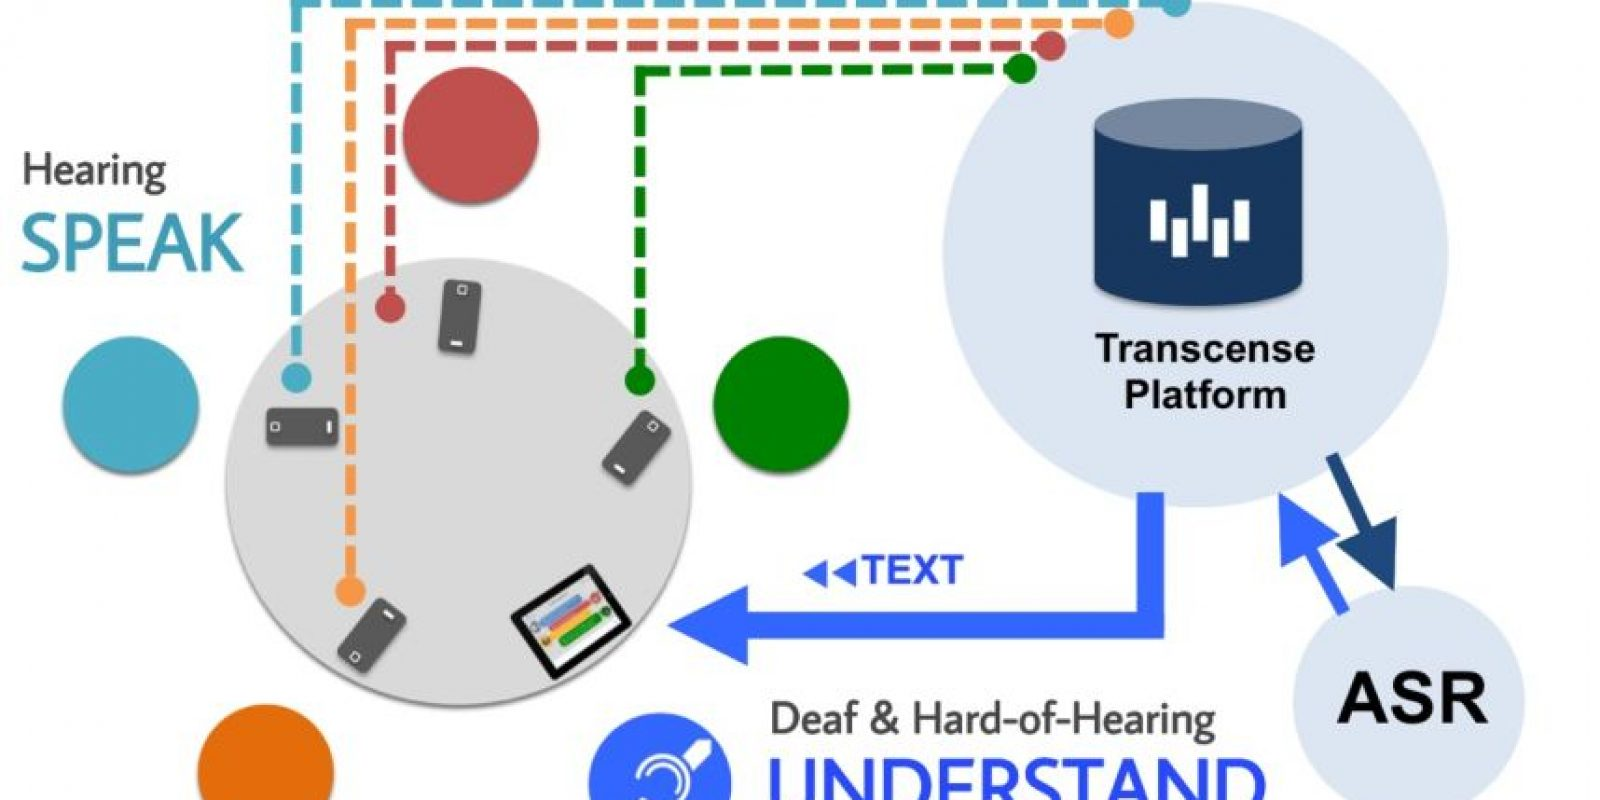 Transcense realiza un complejo proceso para reconocer la voz. Foto:Transcense